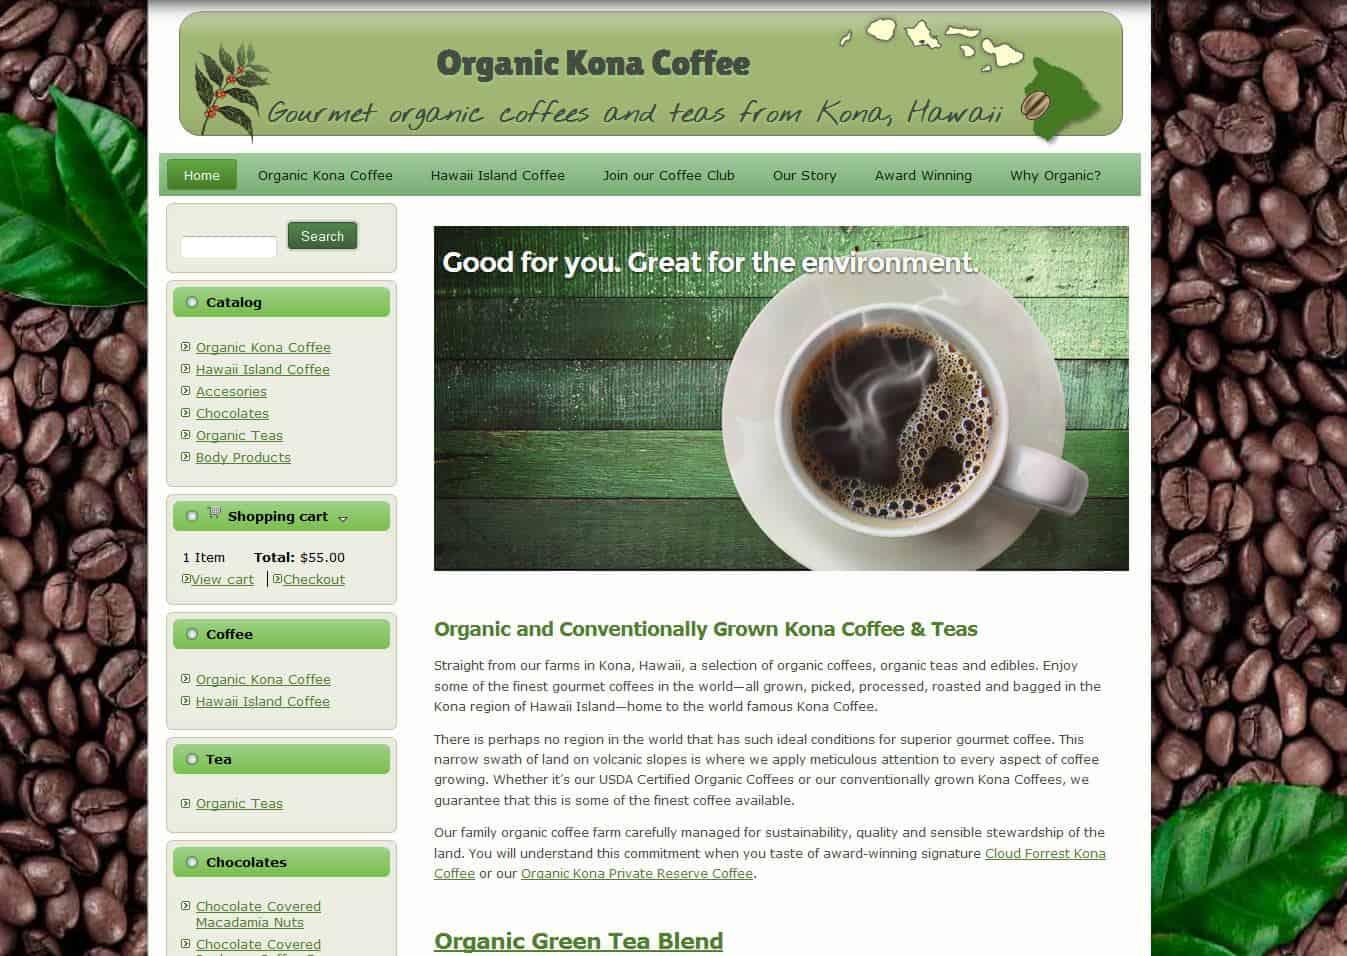 Organic Kona Coffee online store